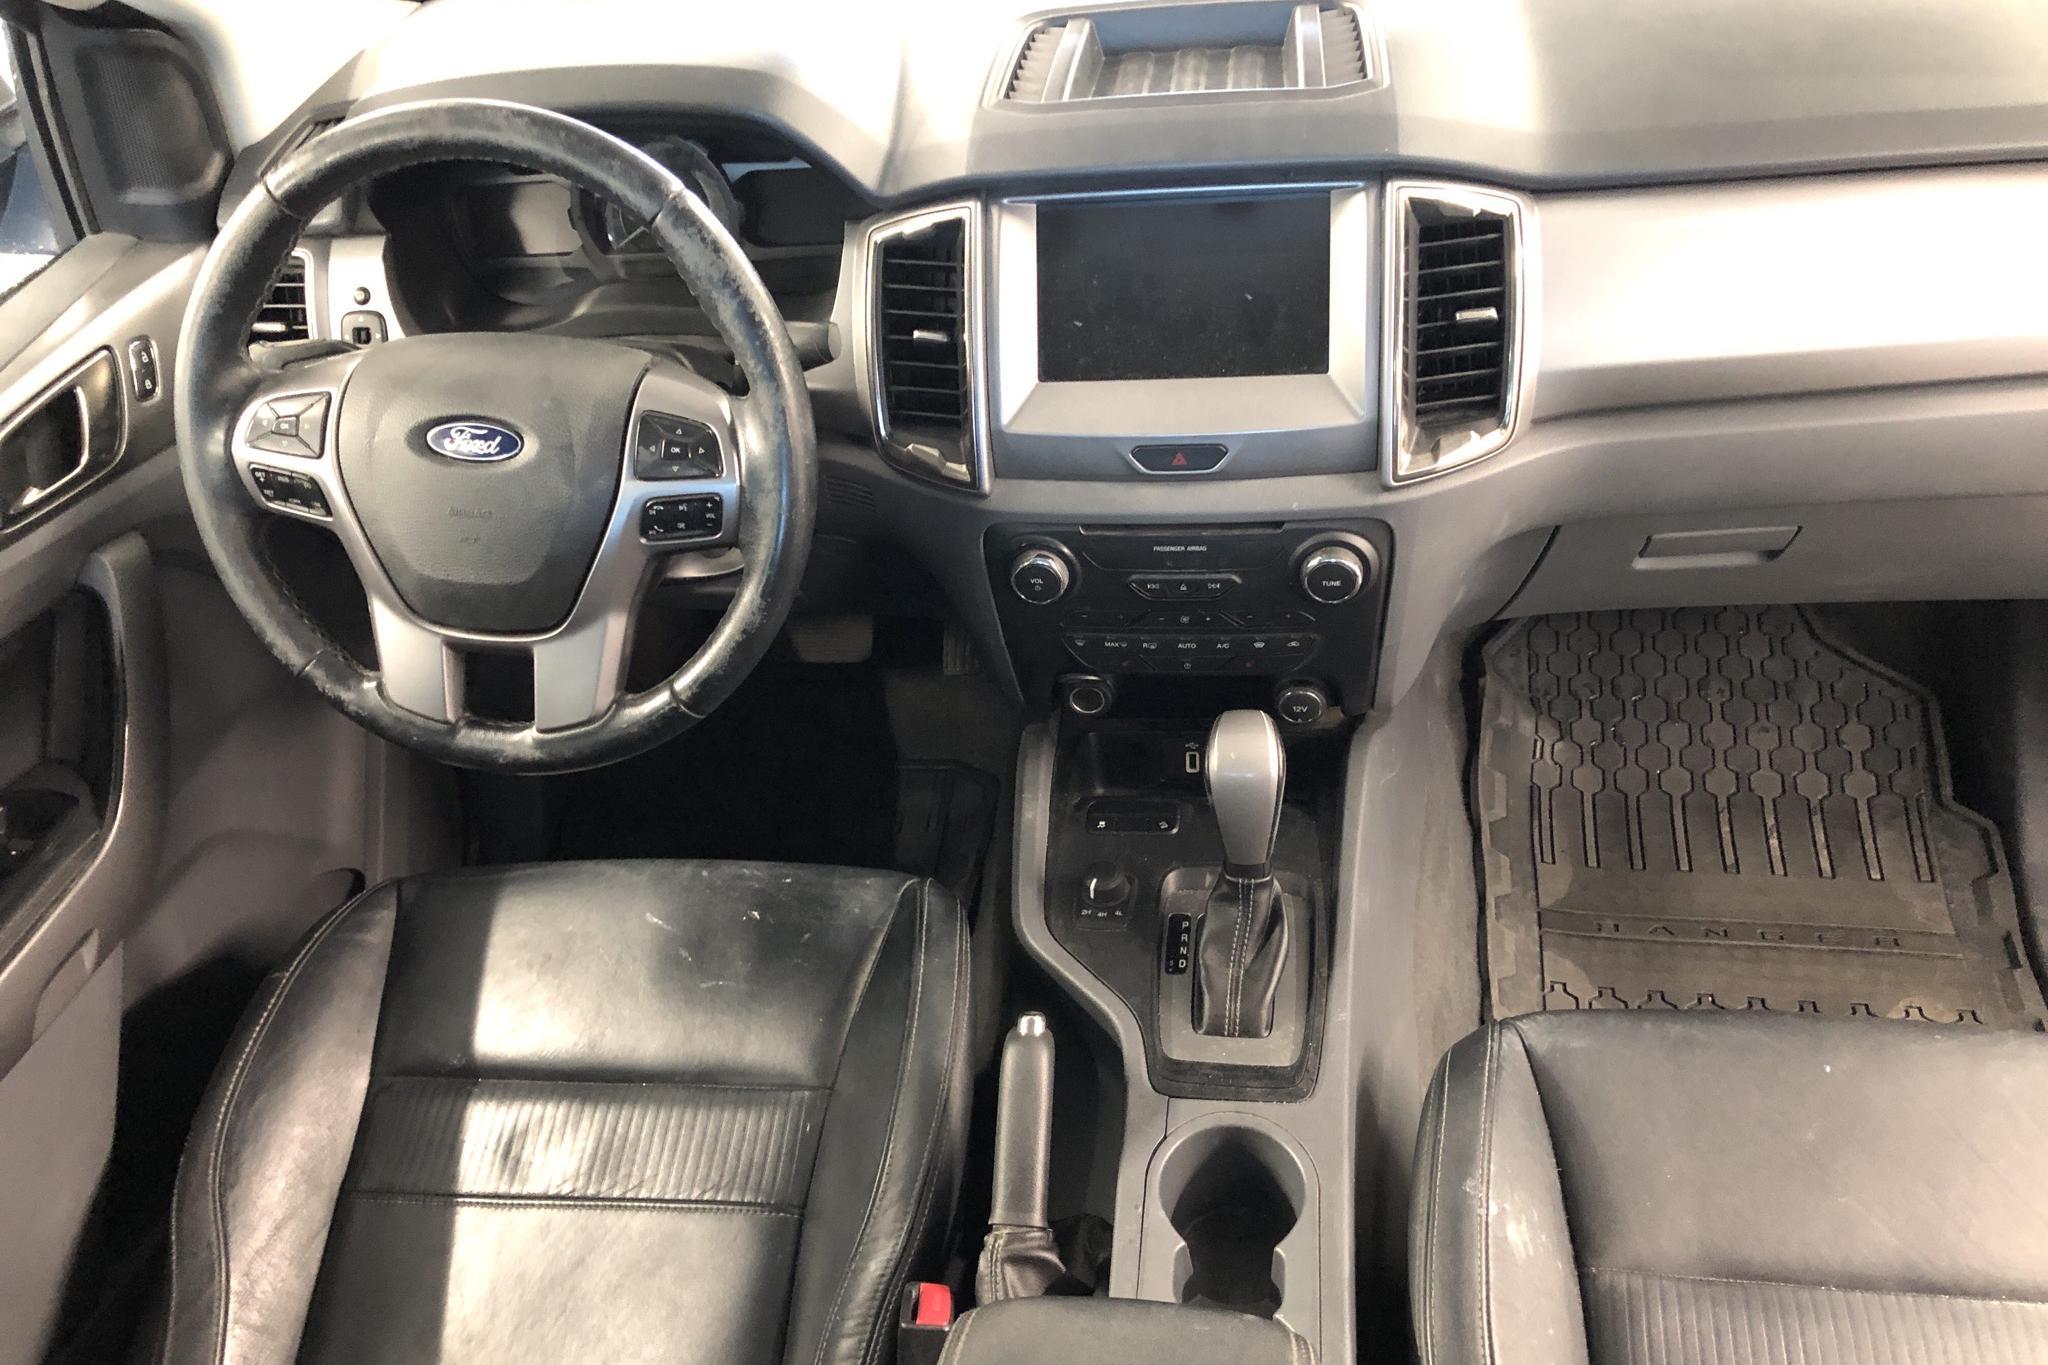 Ford Ranger 2.2 TDCi 4WD (160hk) - 103 330 km - Automatic - white - 2018